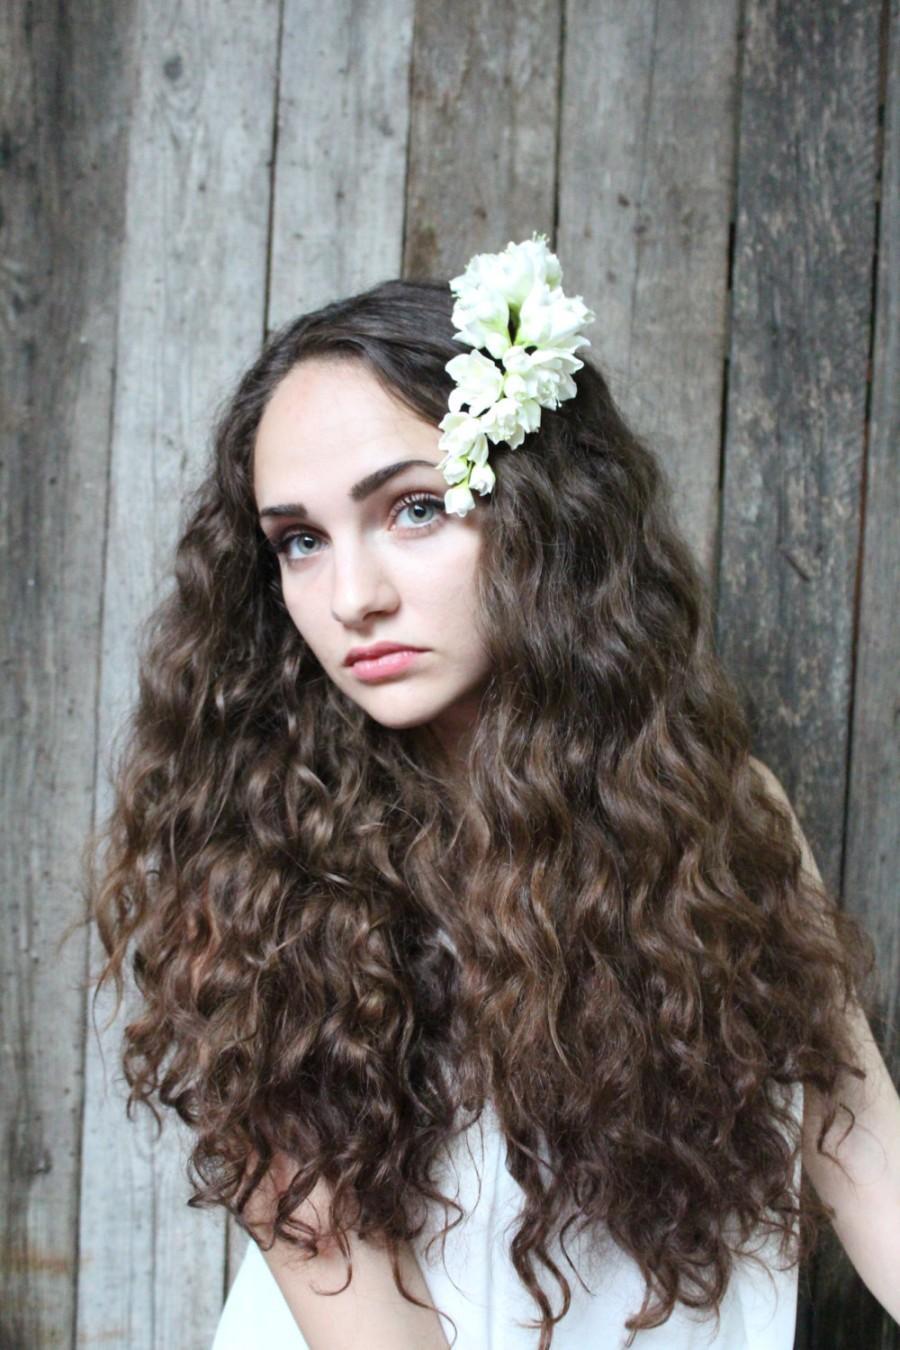 Hochzeit - Аzalea hair flower. Wedding jewelry for brides.  Аzalea hair flower. White azalea on hair comb.  Hair comb polymer clay flowers.